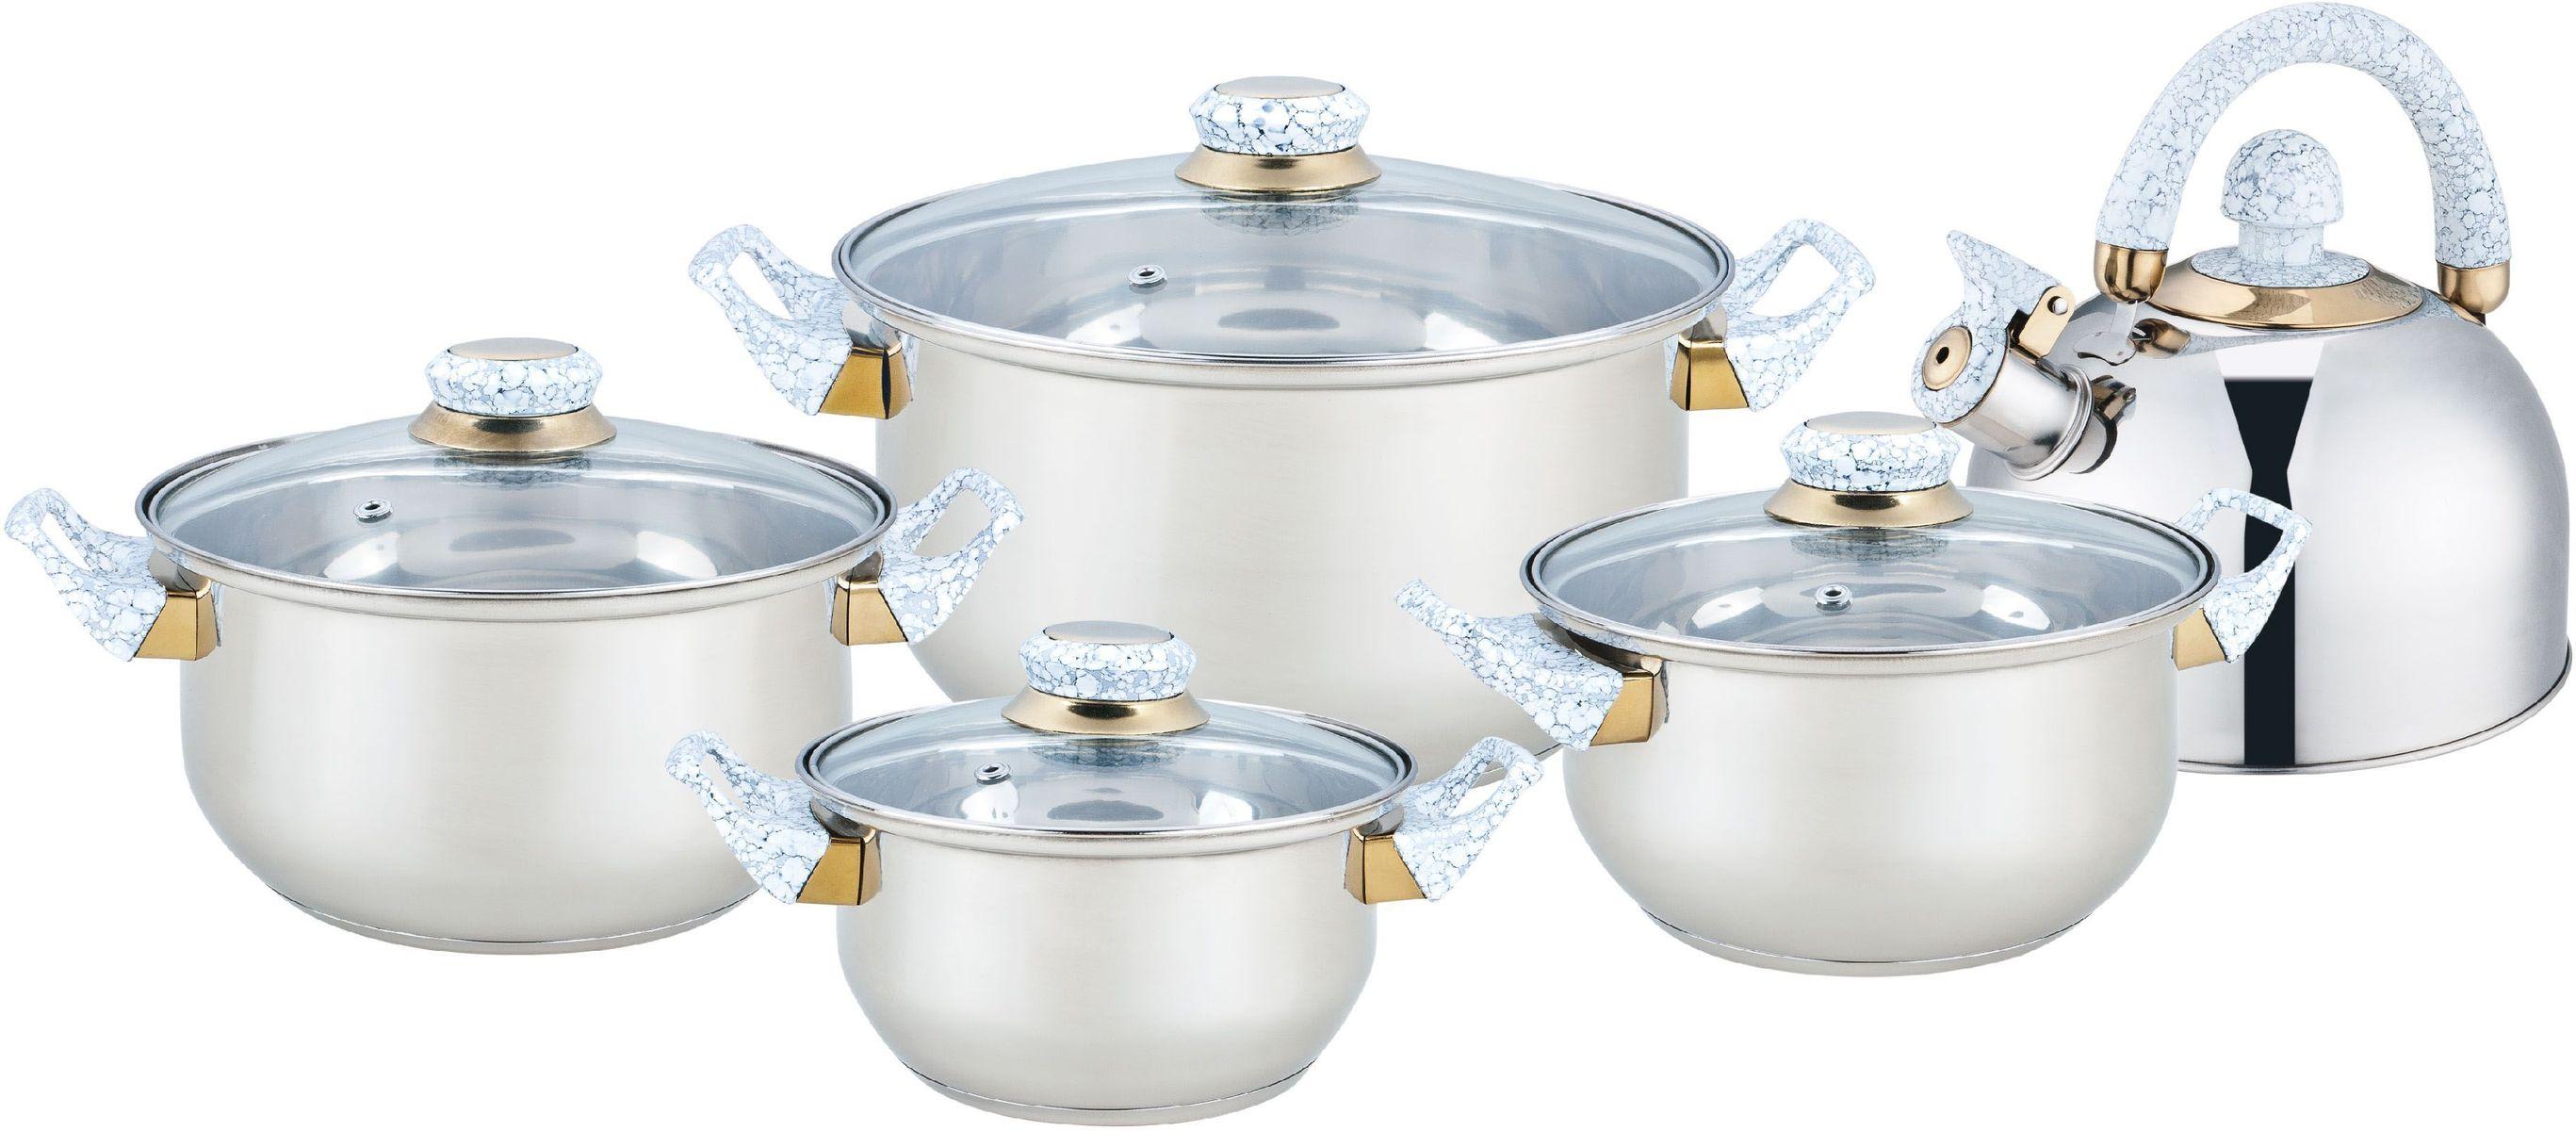 Набор посуды Bekker Classic, 9 предметов. BK-4601 набор посуды bekker classic 9 предметов bk 4605